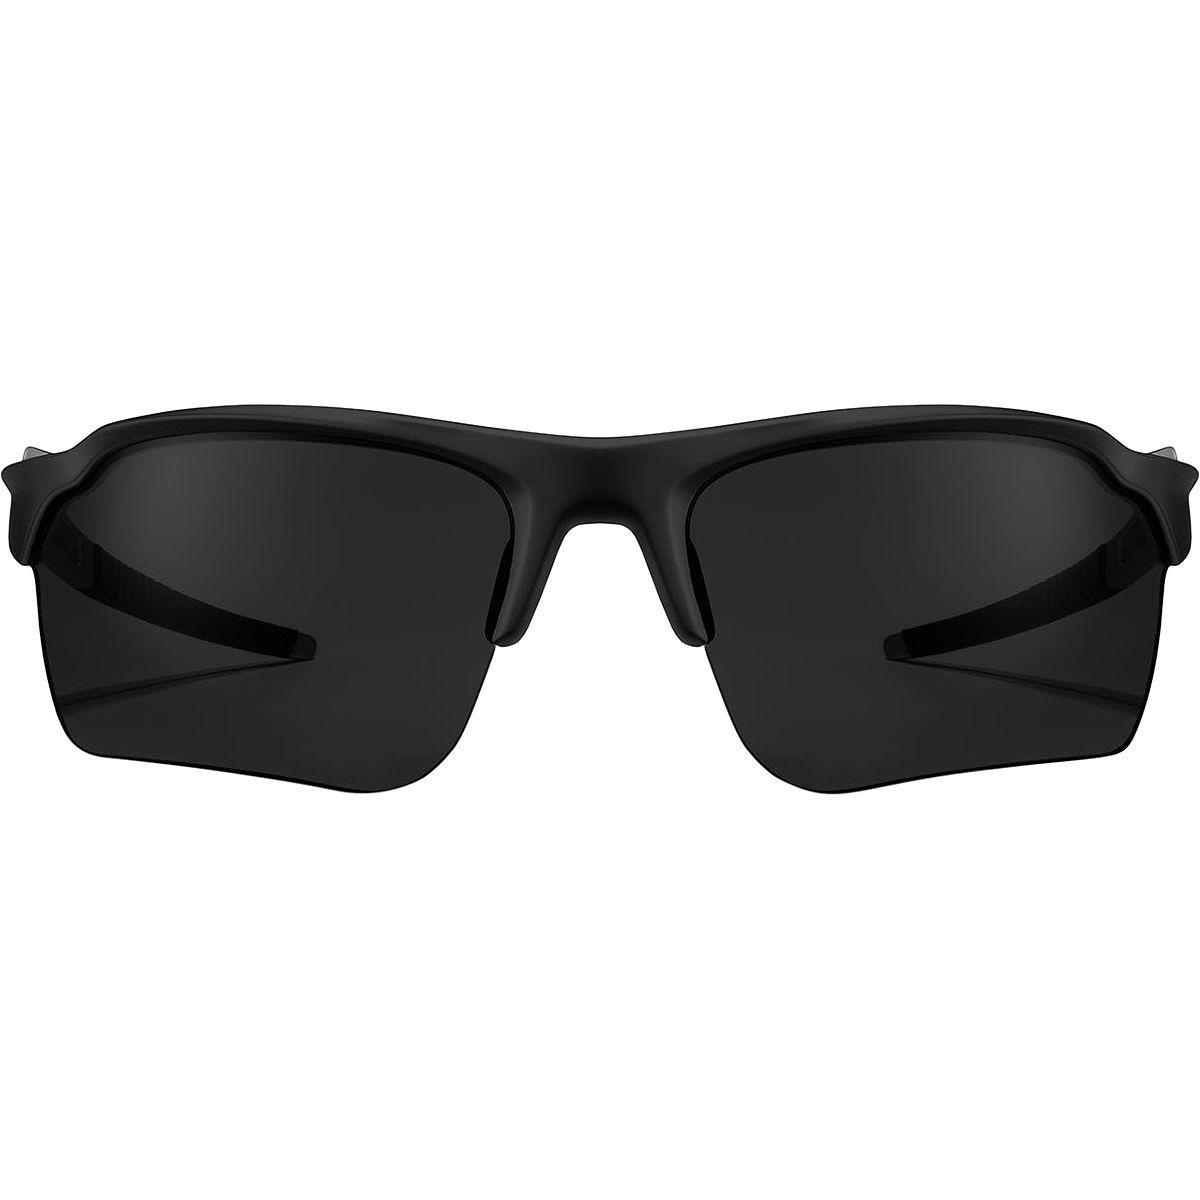 57f3177b8b5 Lyst - Roka Apex Tl-1 Polarized Sunglasses in Black for Men